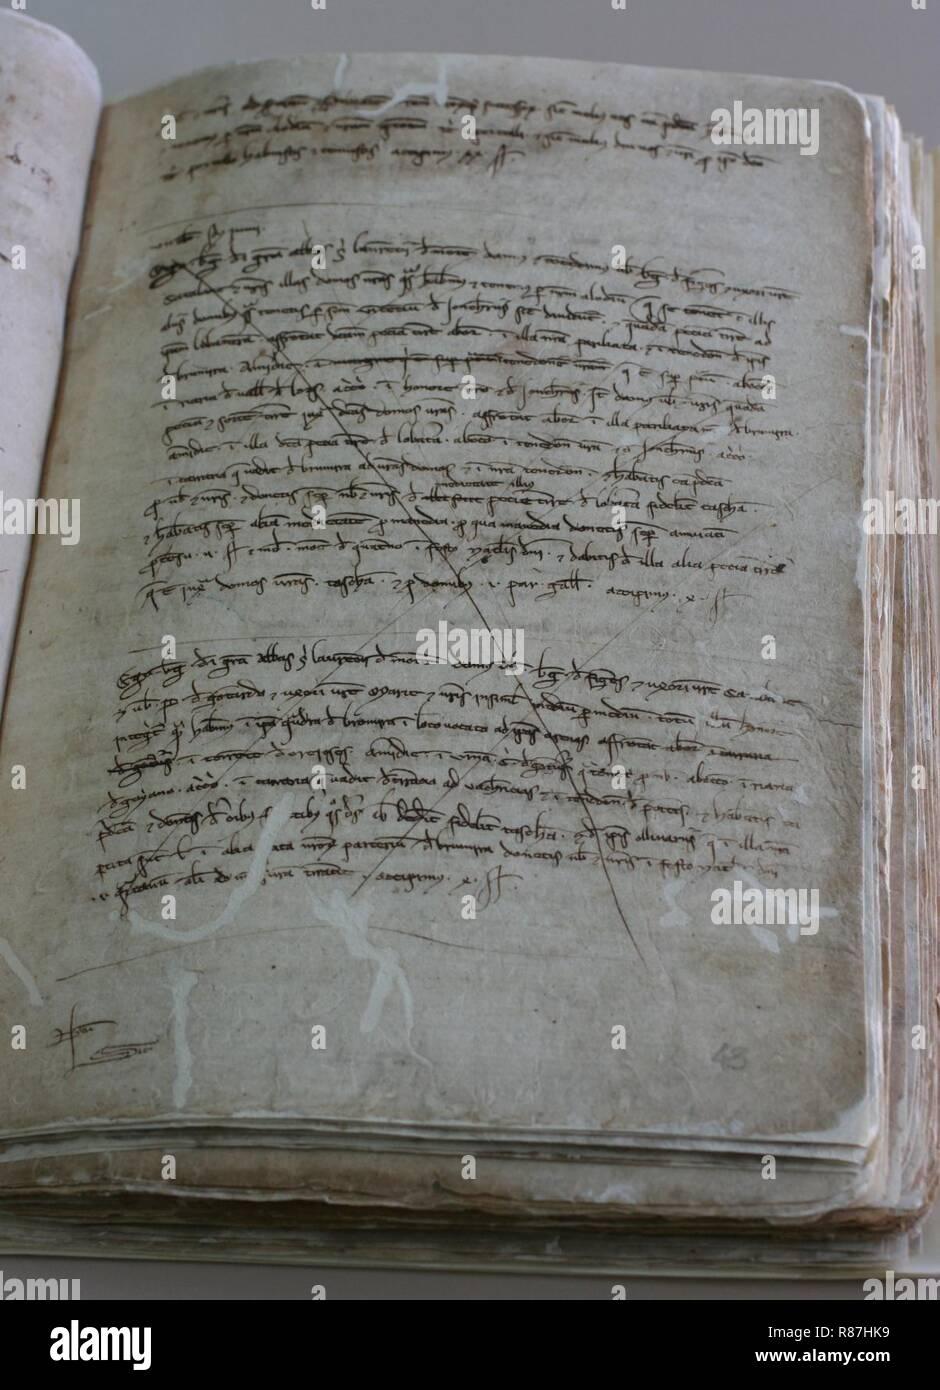 Capbreu bertran acolit 1237-1242f. 43r acvoc. - Stock Image